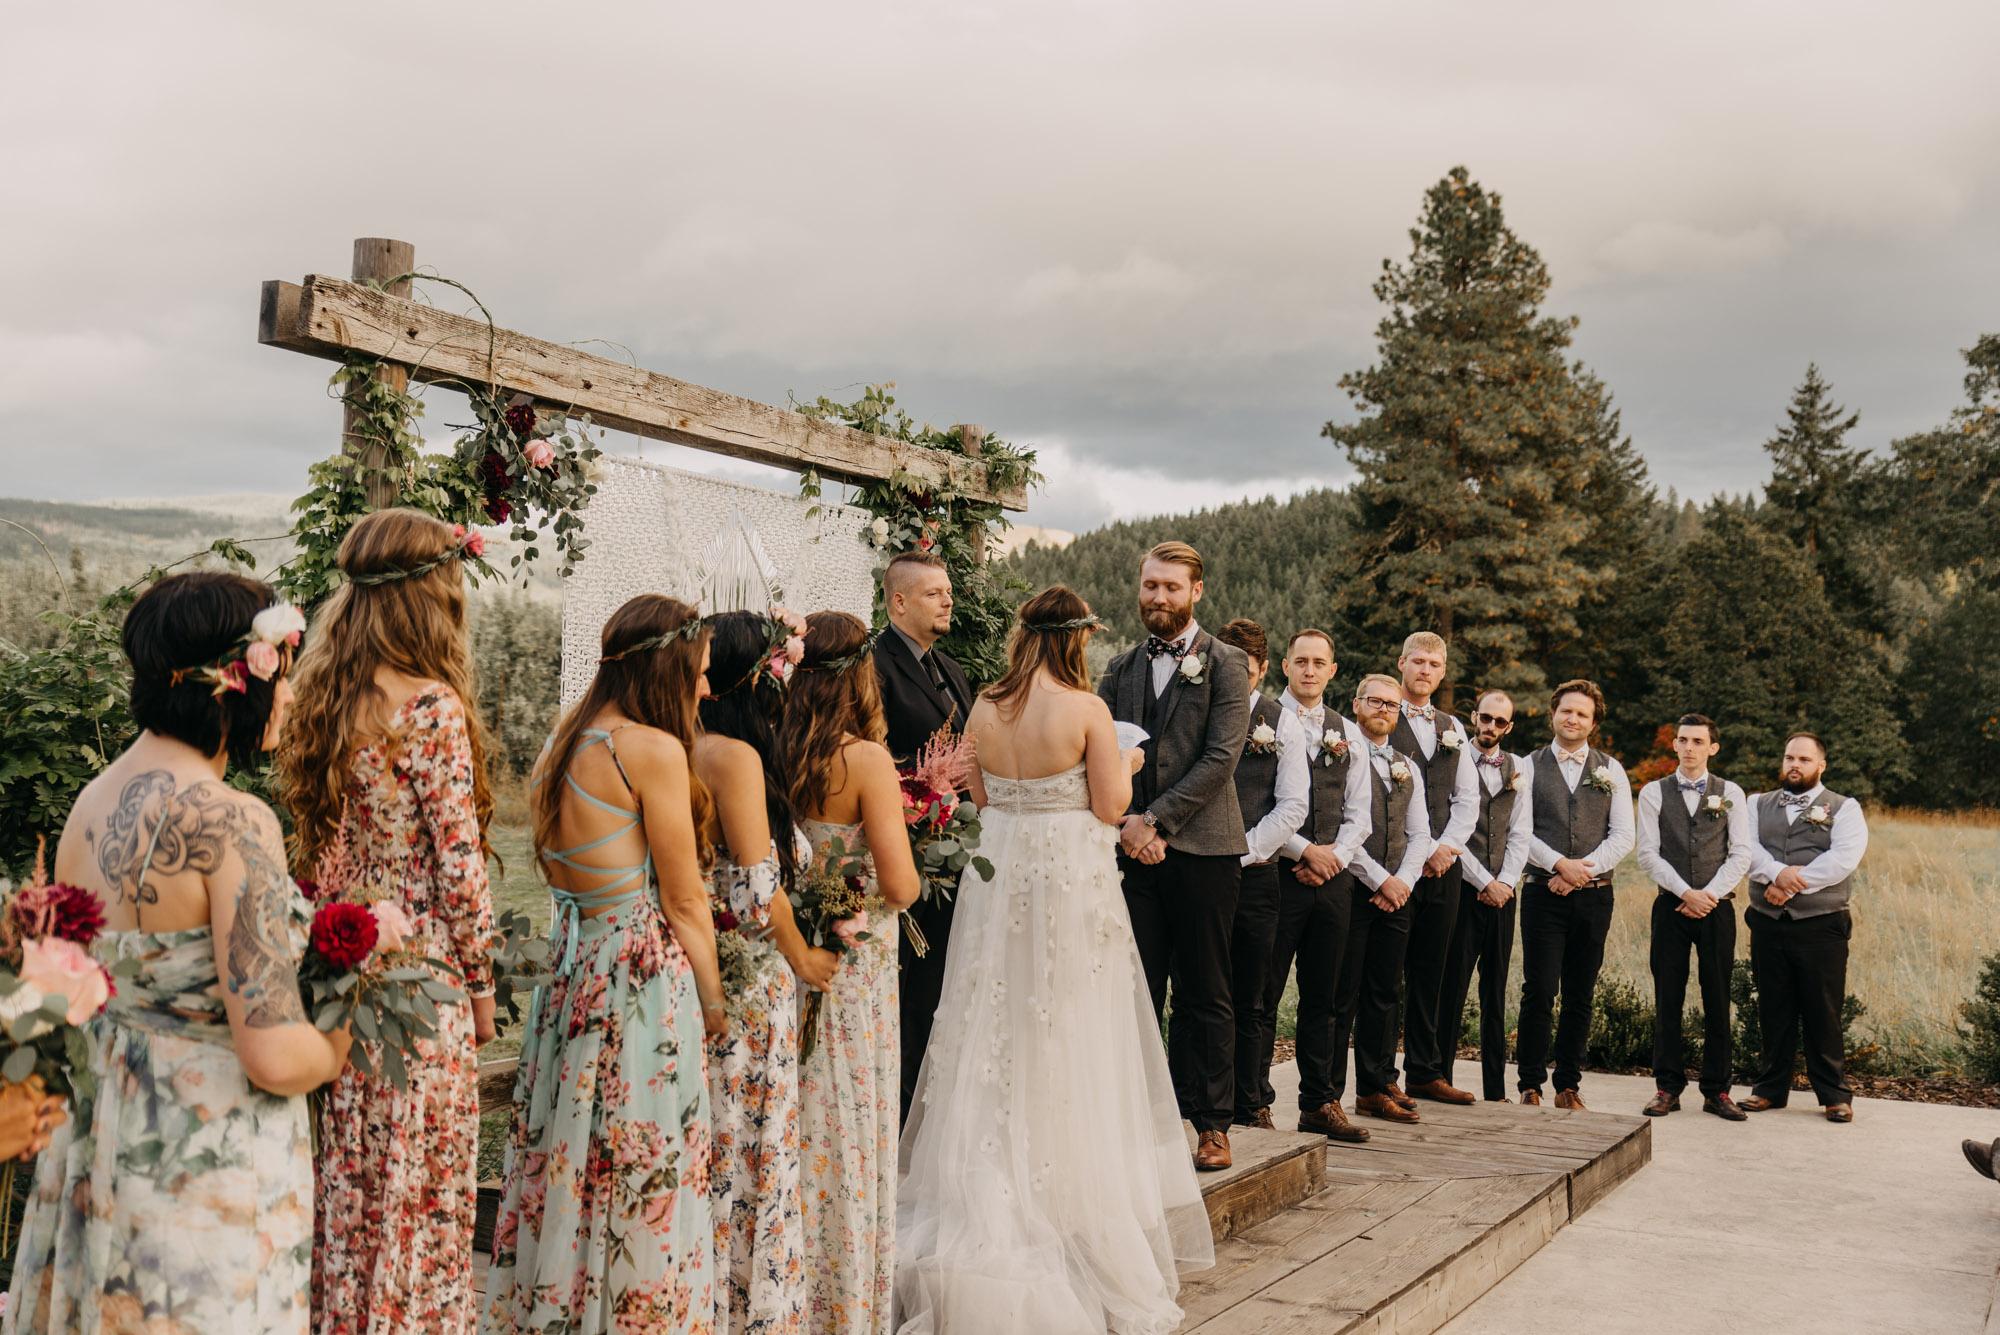 Outdoor-Summer-Ceremony-Washington-Wedding-Rainbow-5398.jpg